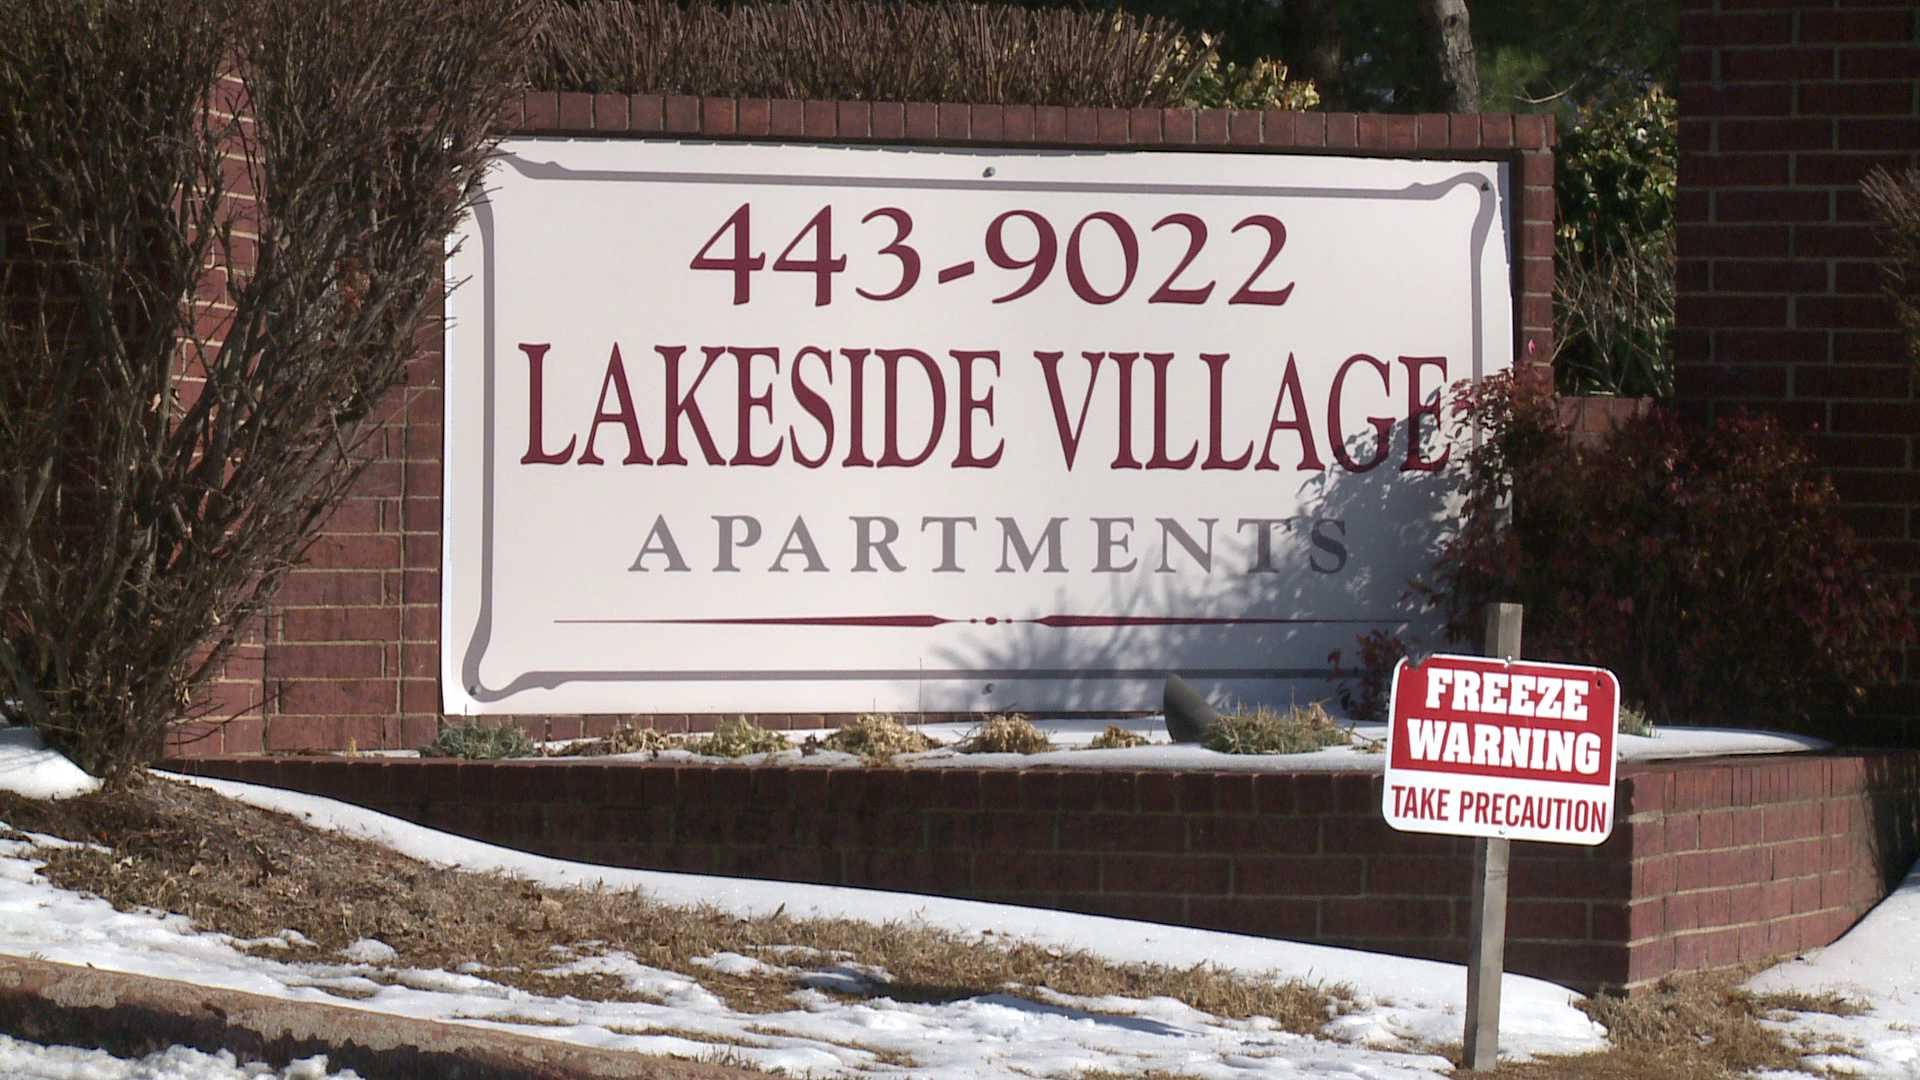 armed robbery lakeside village apts